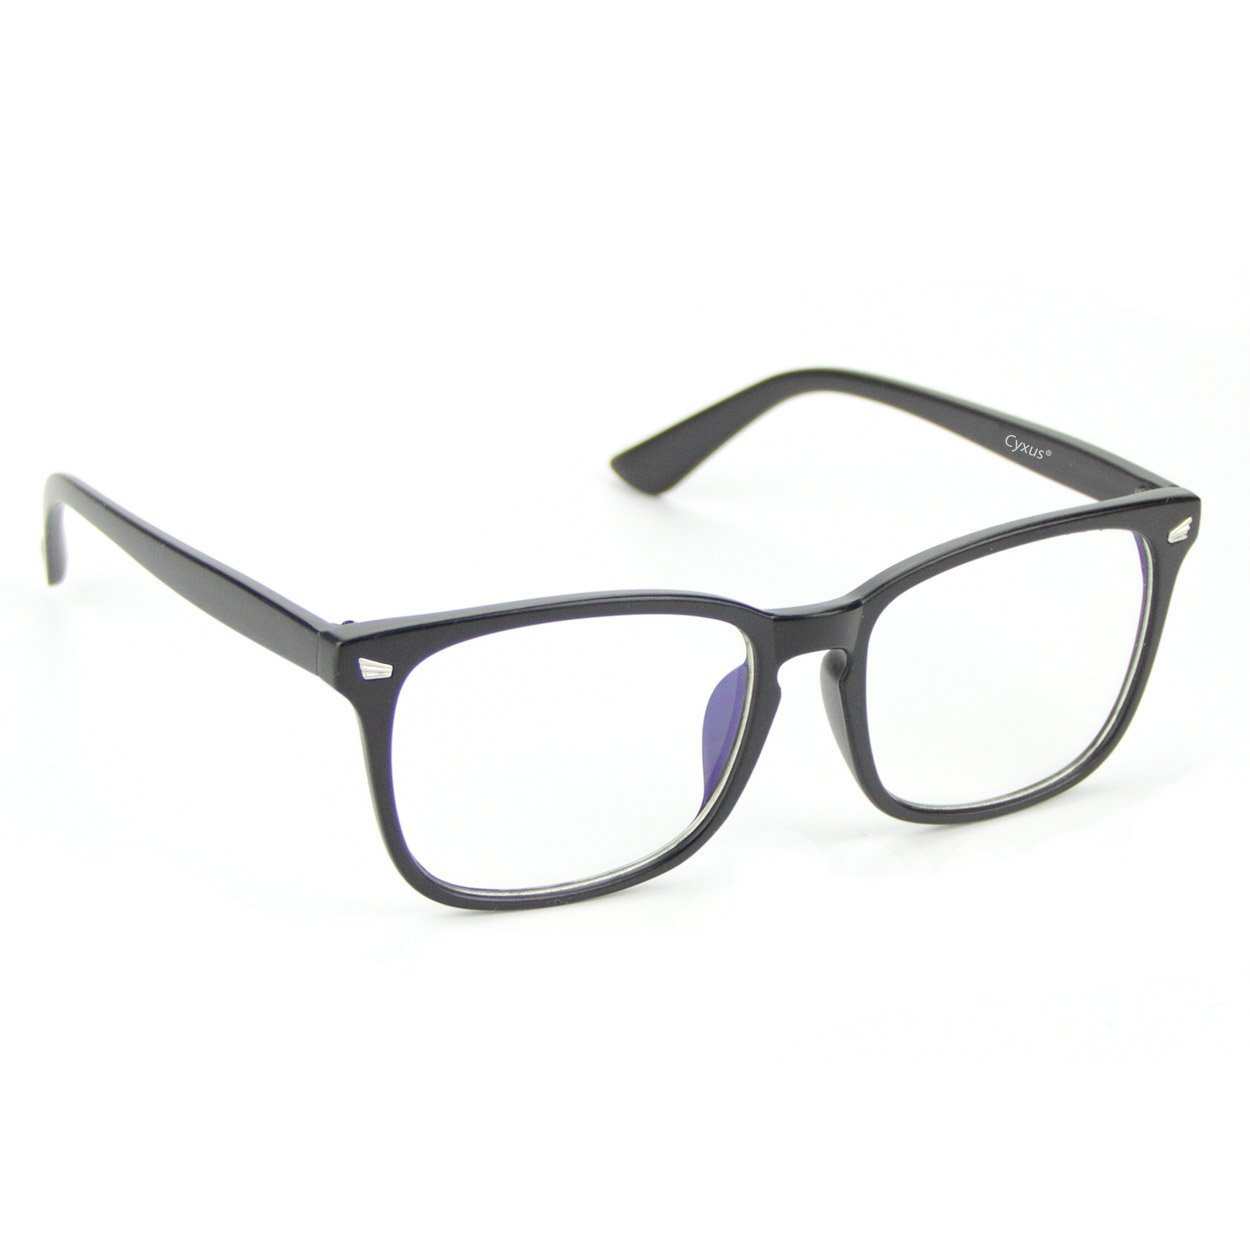 36585082899 Cyxus Blue Light Filter Computer Glasses for Blocking UV Headache  Anti Eye  Eyestrain  Transparent